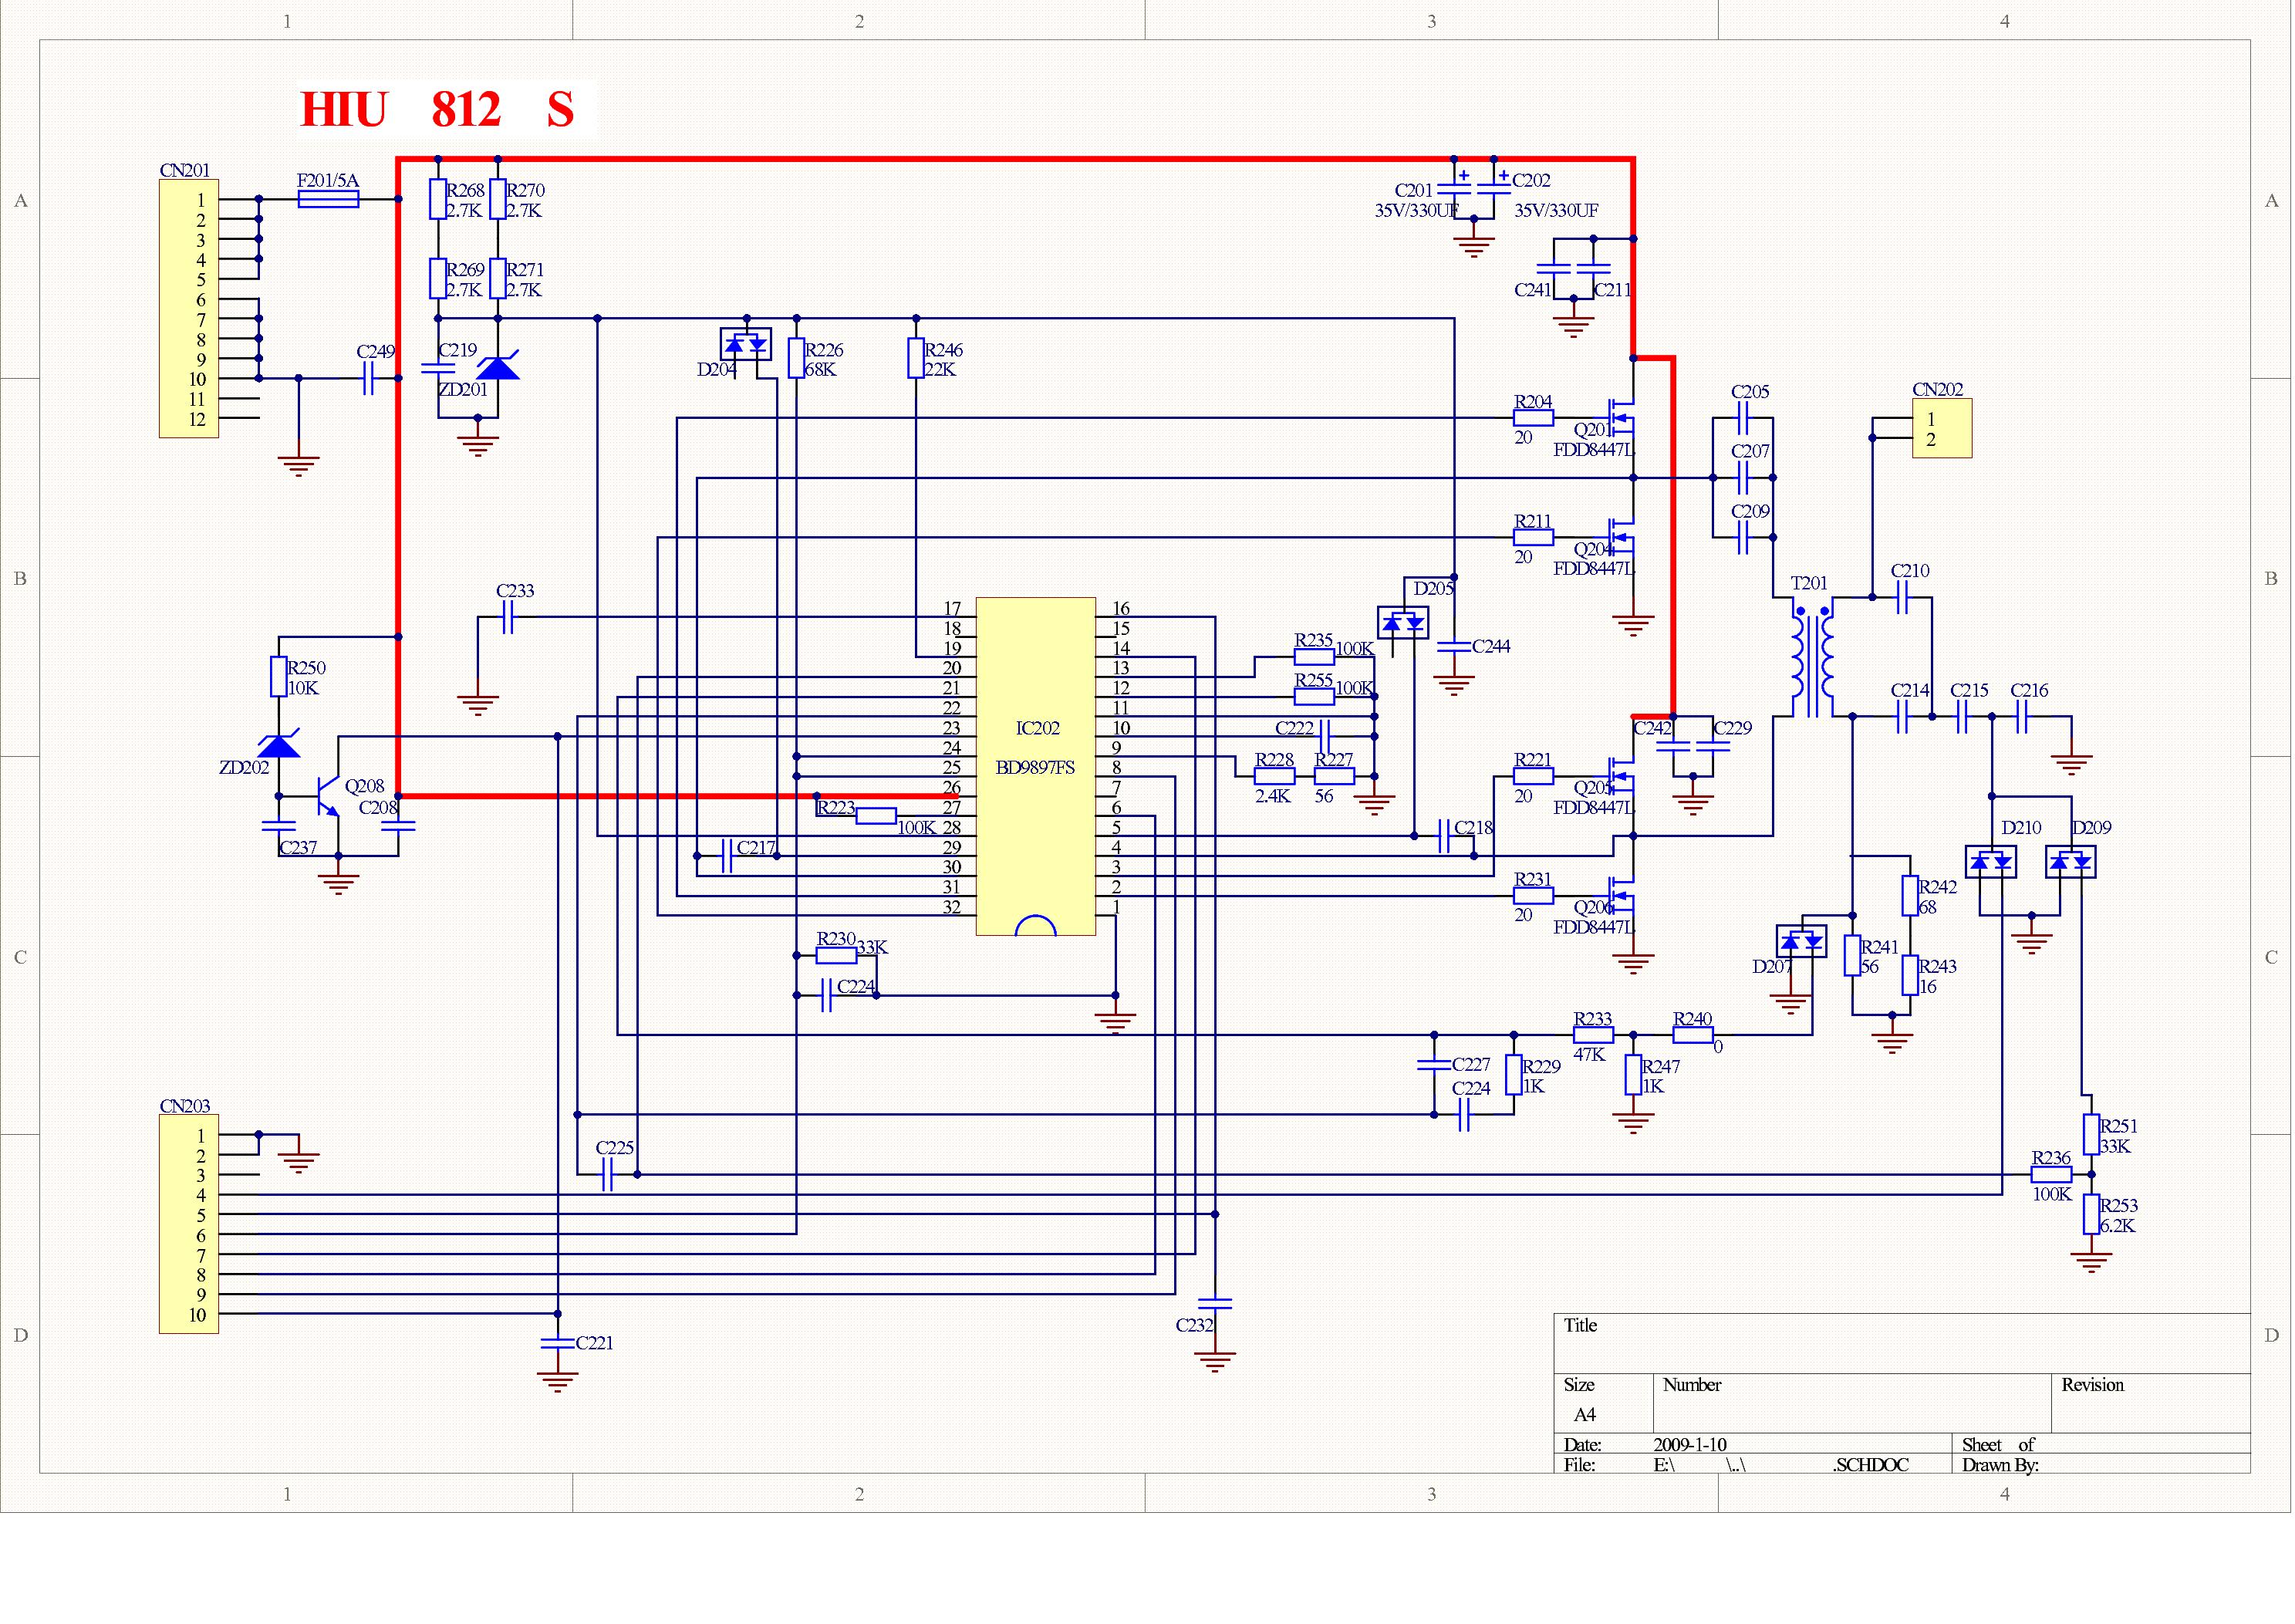 Hiu812 Lcd Tv Inverter Based On Bd9897fs 2 Sch Service